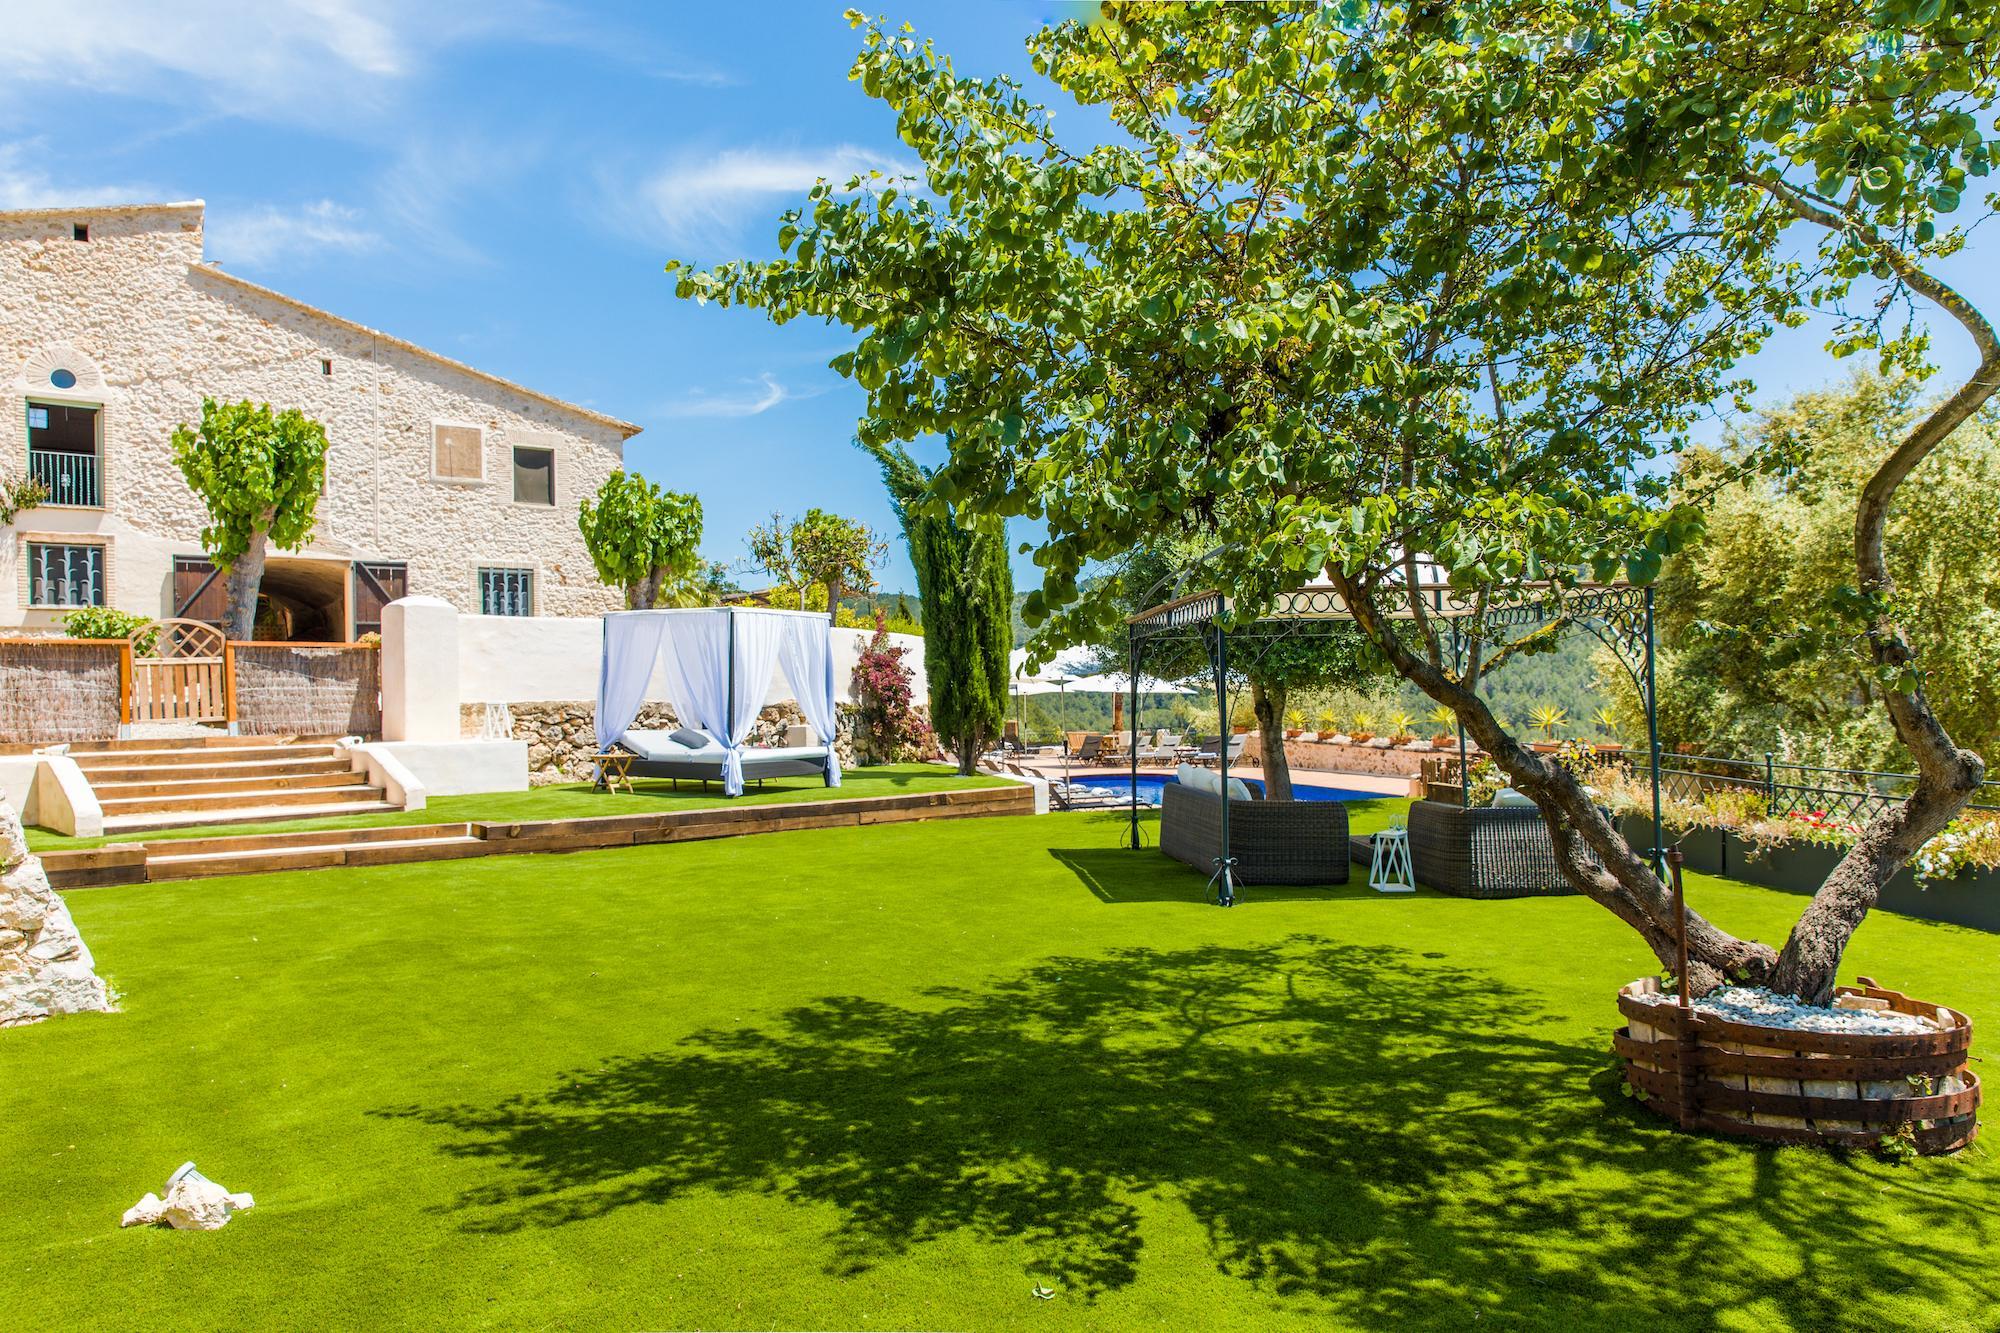 Large Barcelona Villa lawn